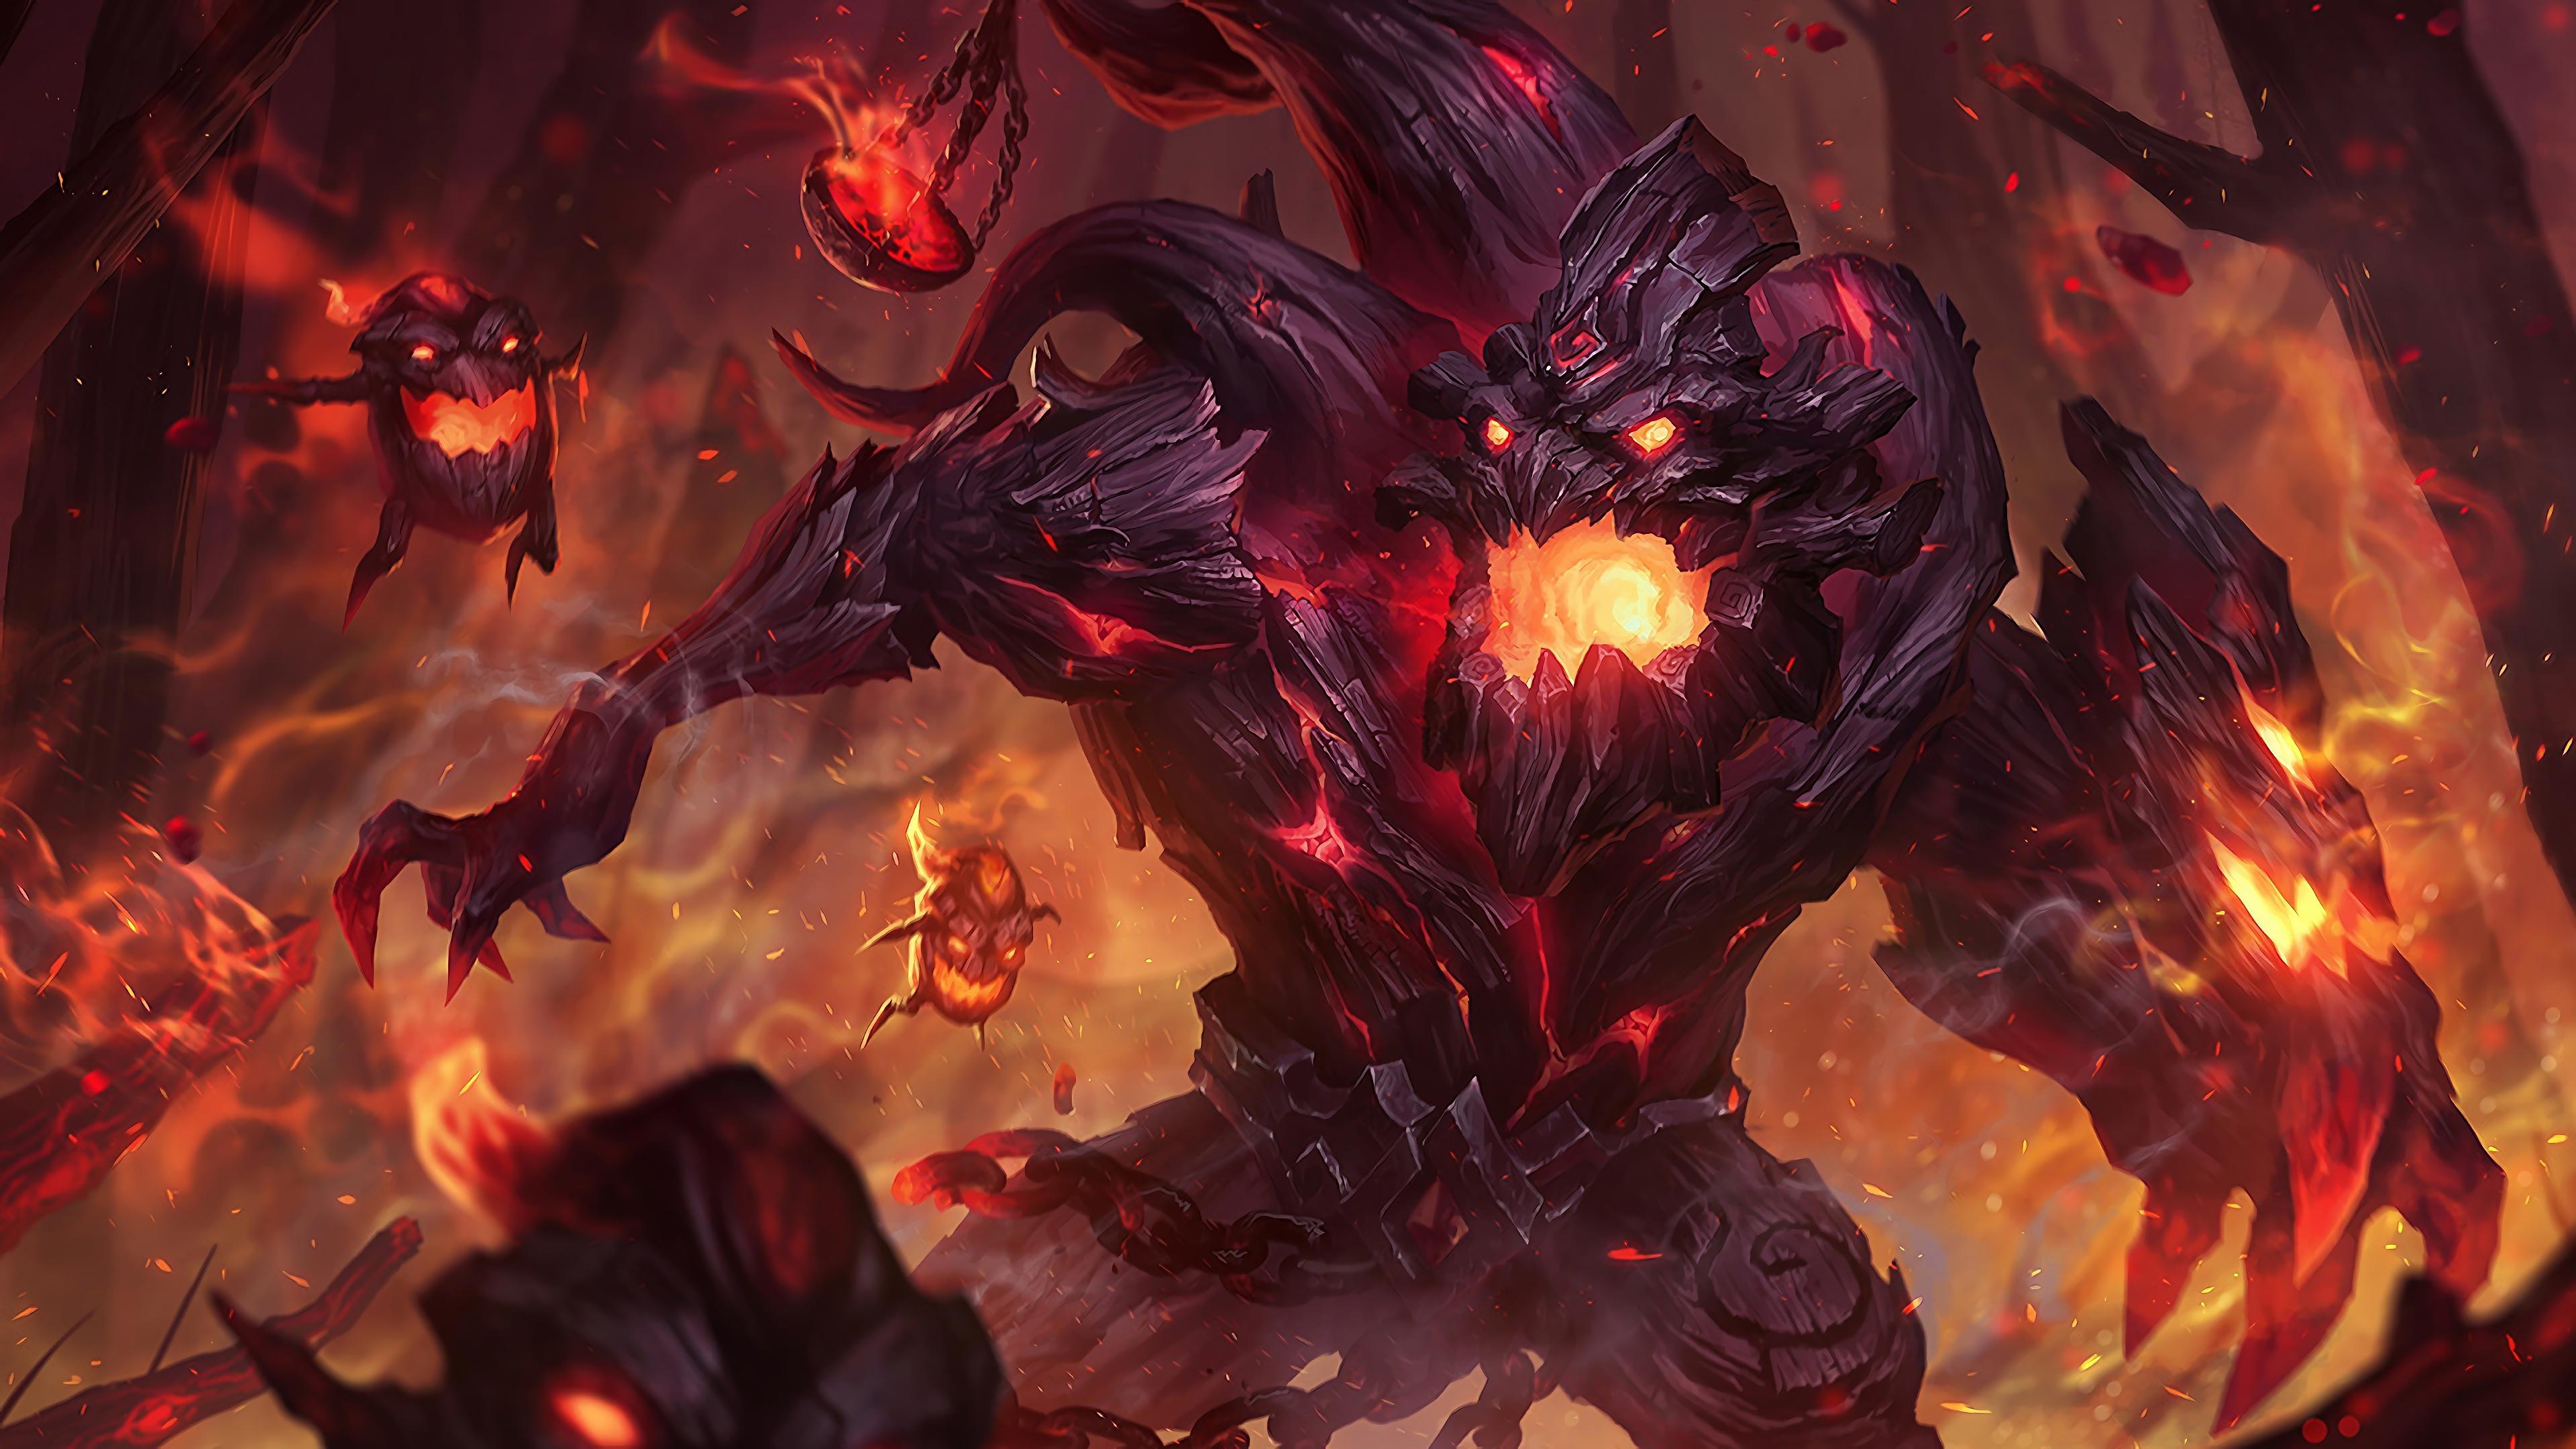 charred maokai lol splash art league of legends lol 1574101594 - Charred Maokai LoL Splash Art League of Legends lol - Maokai, league of legends